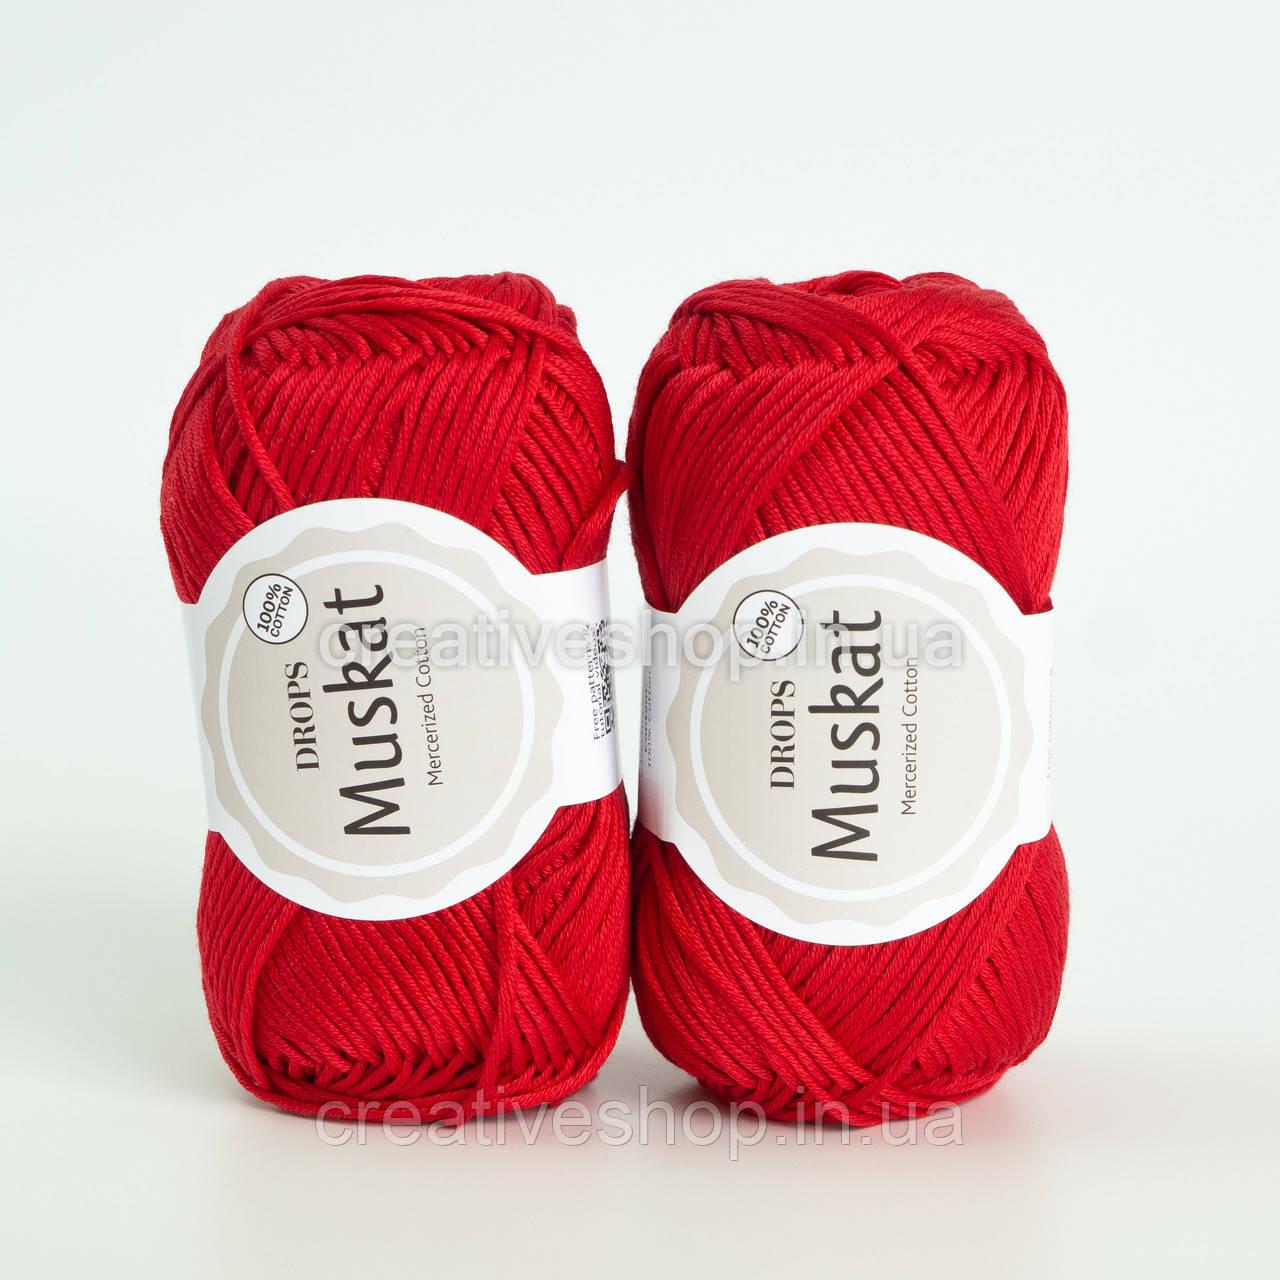 Пряжа DROPS Muskat (колір 12 red)